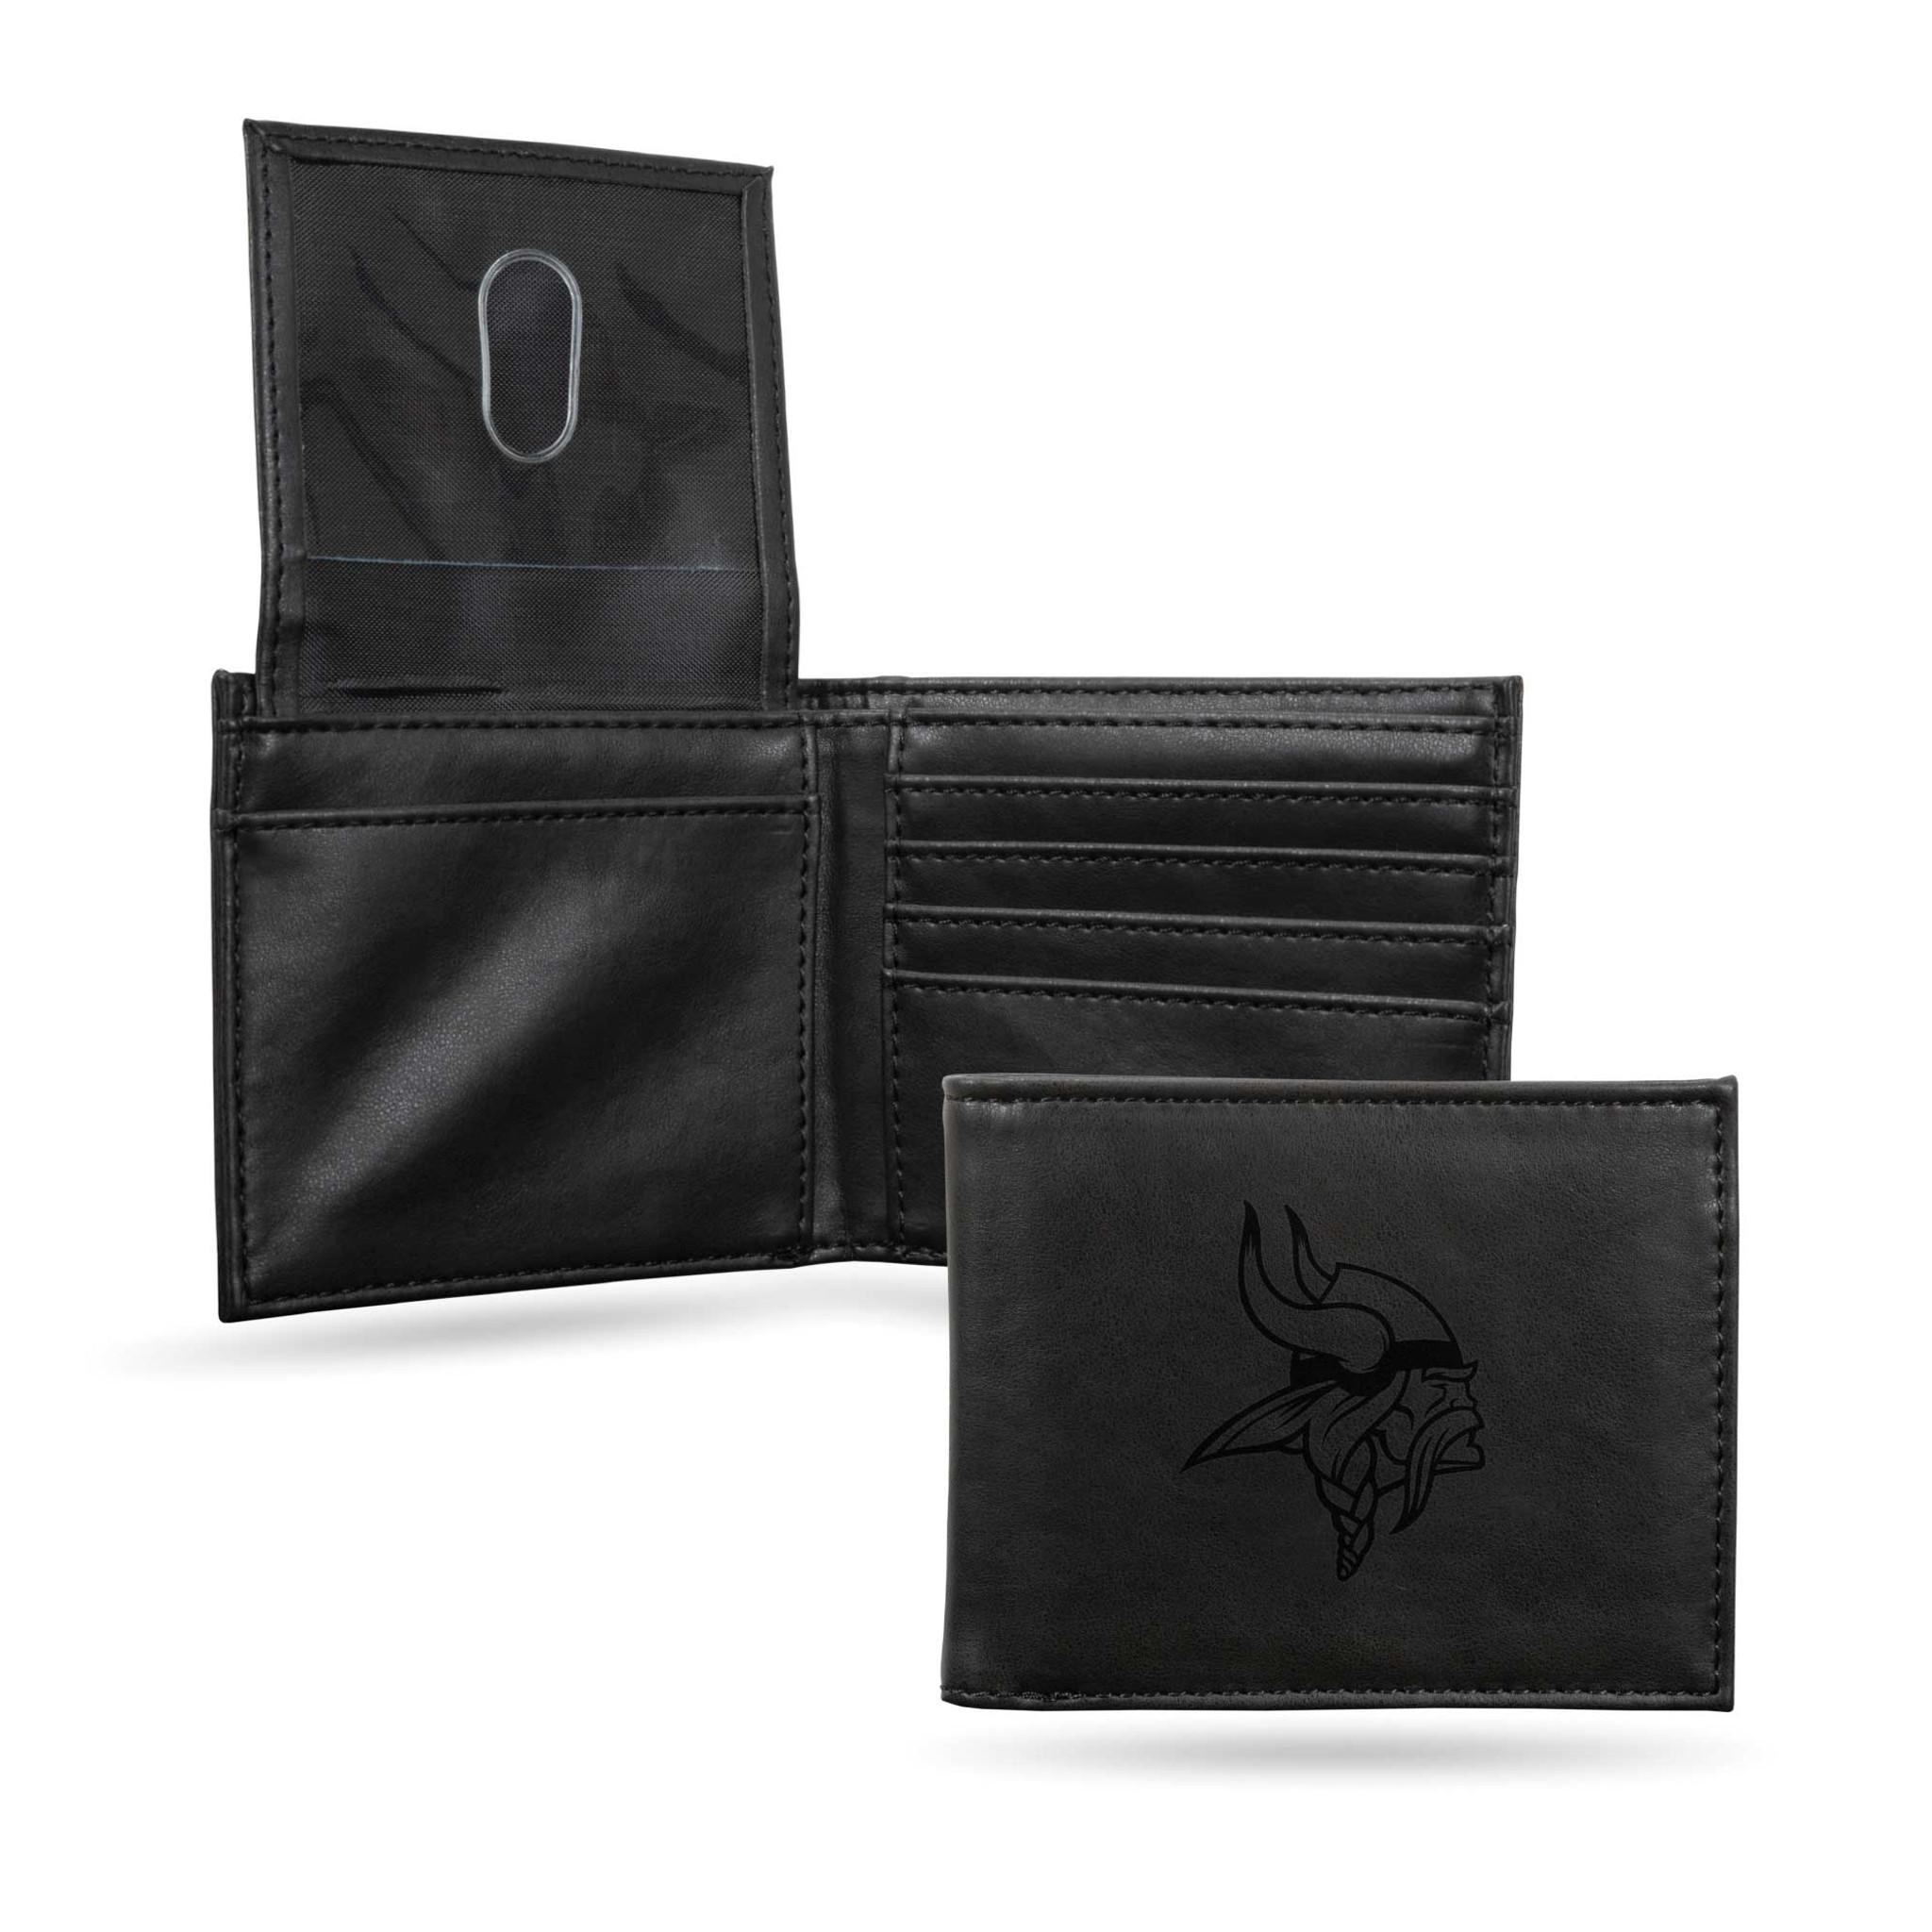 NFL Baltimore Ravens Leather Bi-fold Wallet